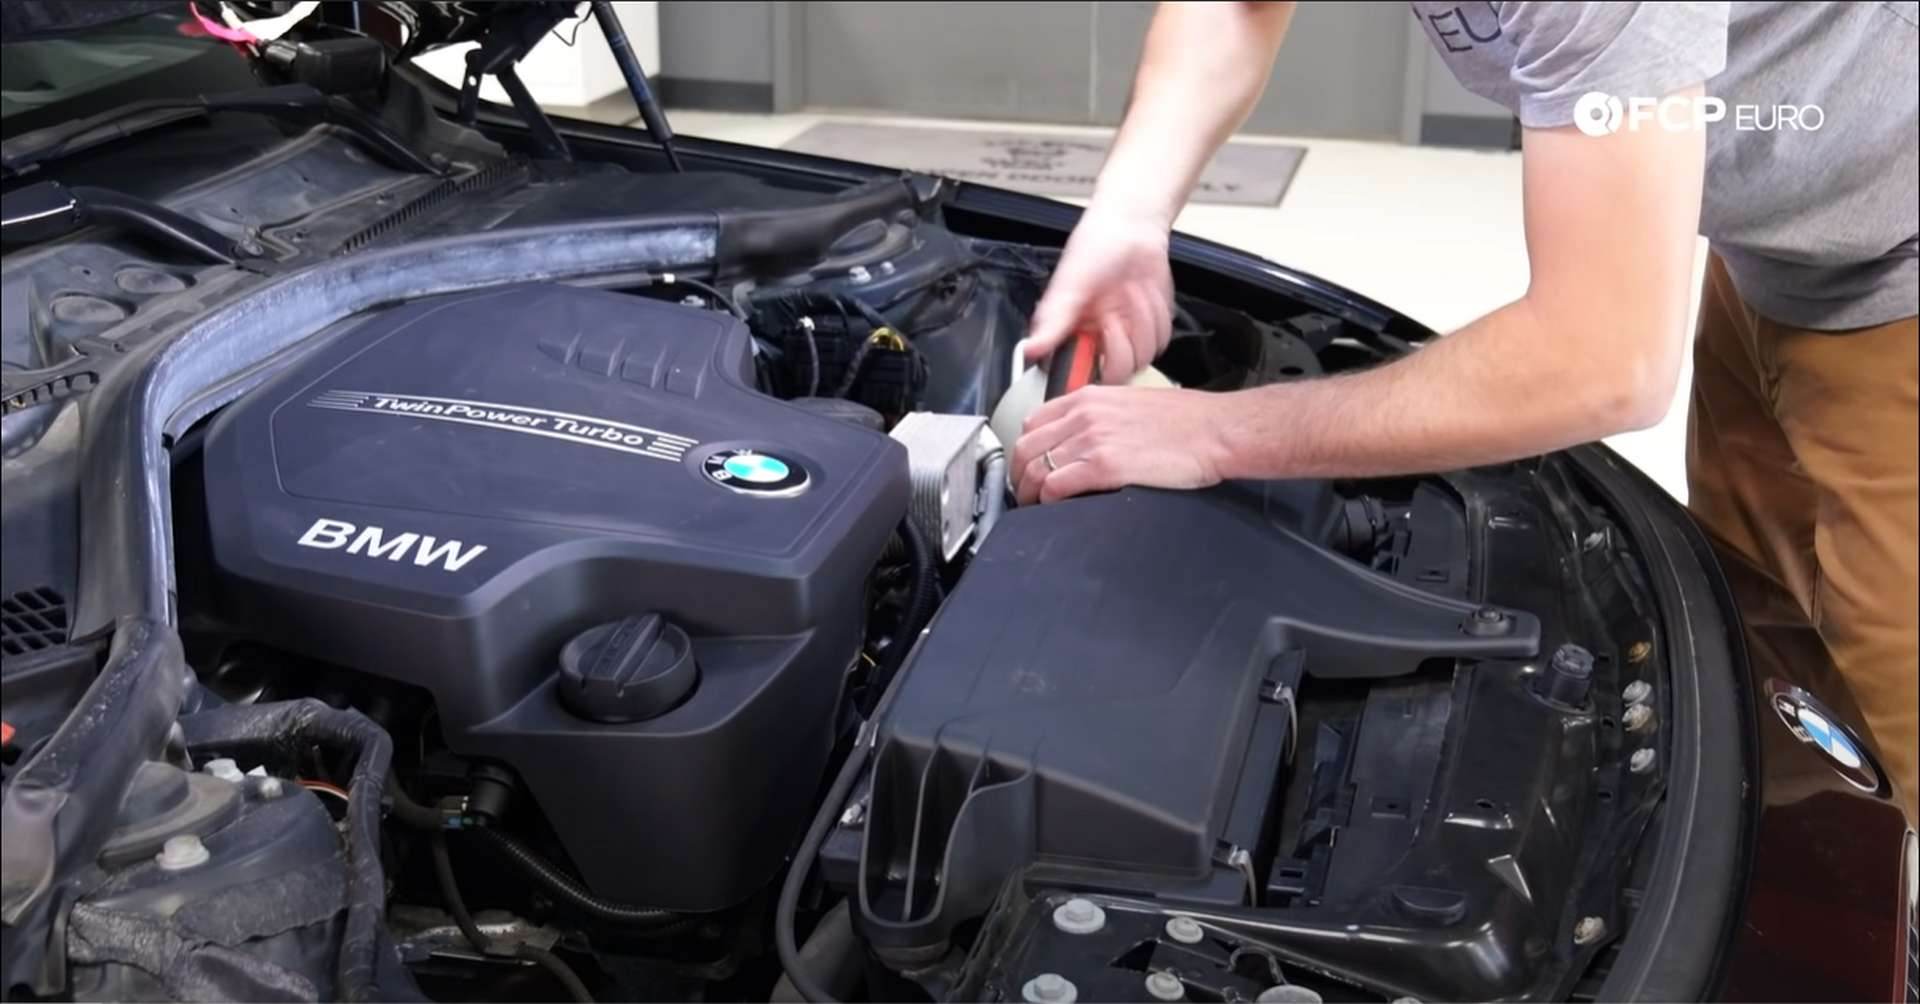 01-DIY-N20-Water-Pump-Thermostat-Replacement_Removing-Intake